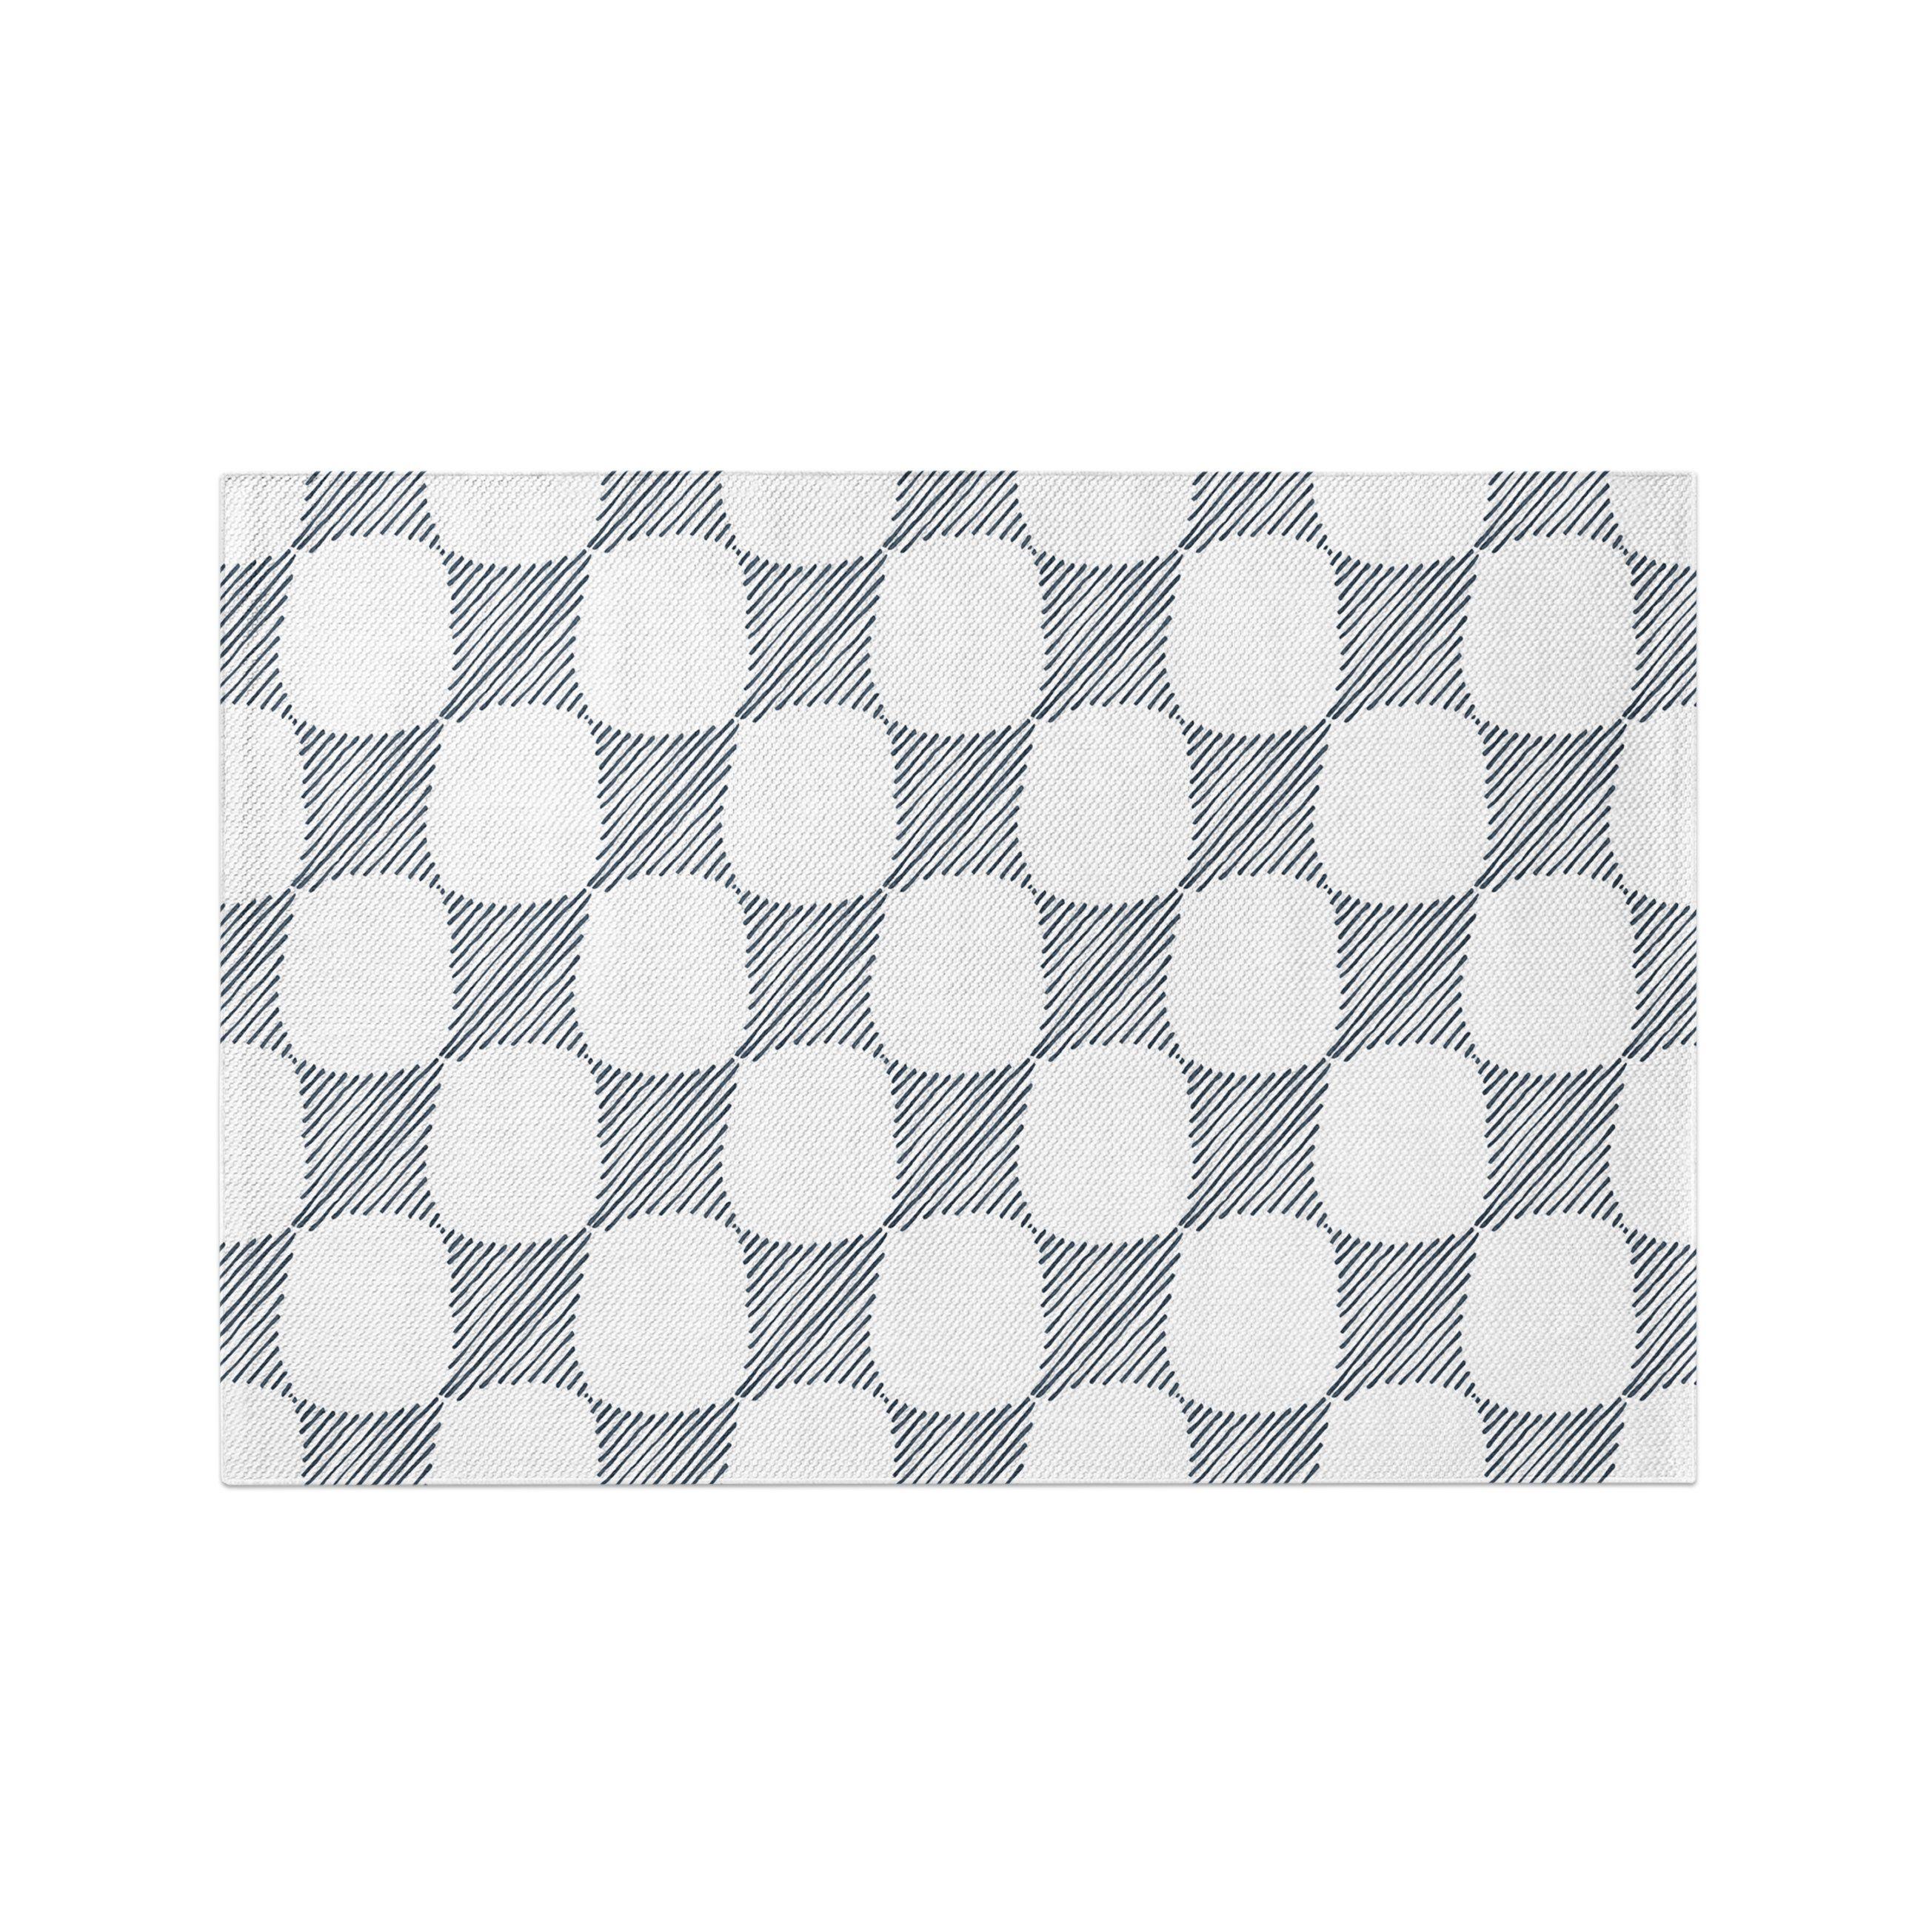 Indigo Abstract Geometric Pattern Dobby Rug   Woven Rug, Large Area ...